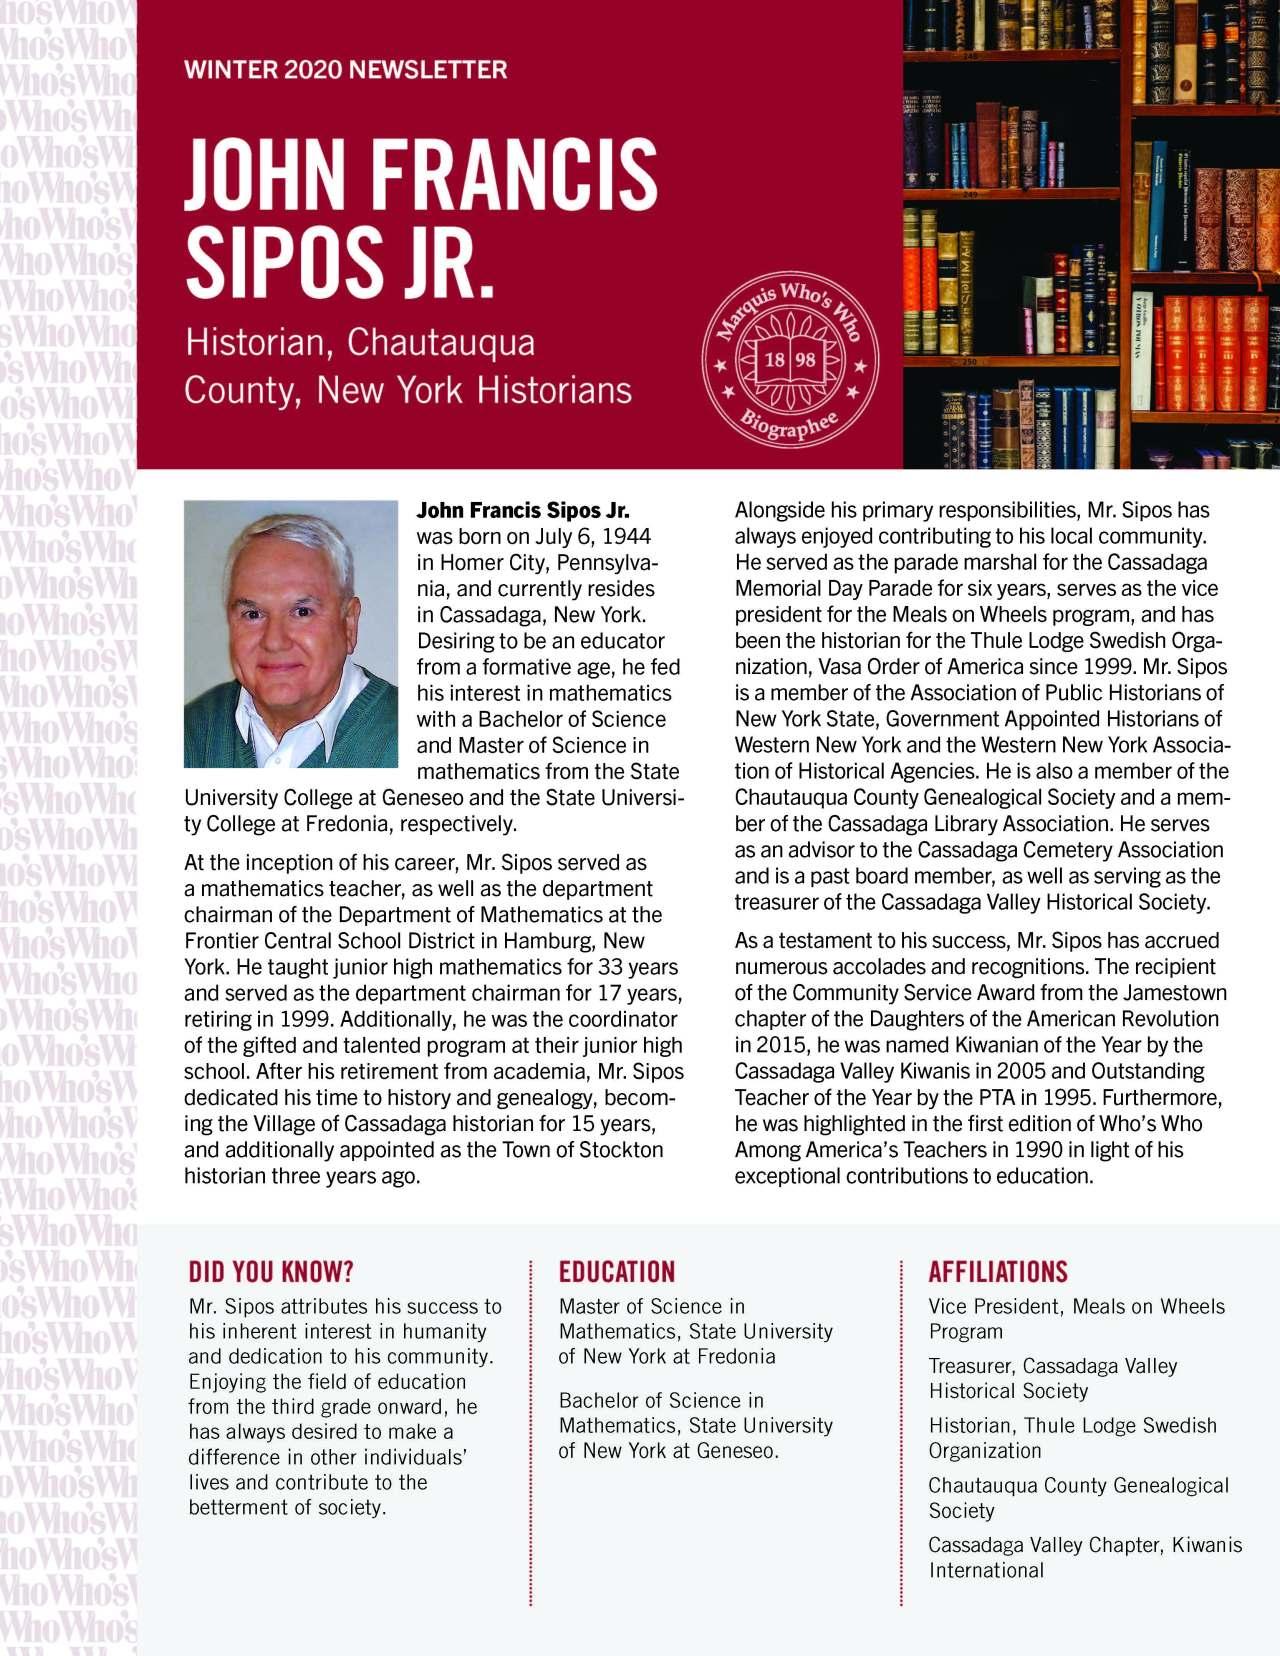 Sipos, John 4791488_4004791488 Newsletter REVISED jpeg